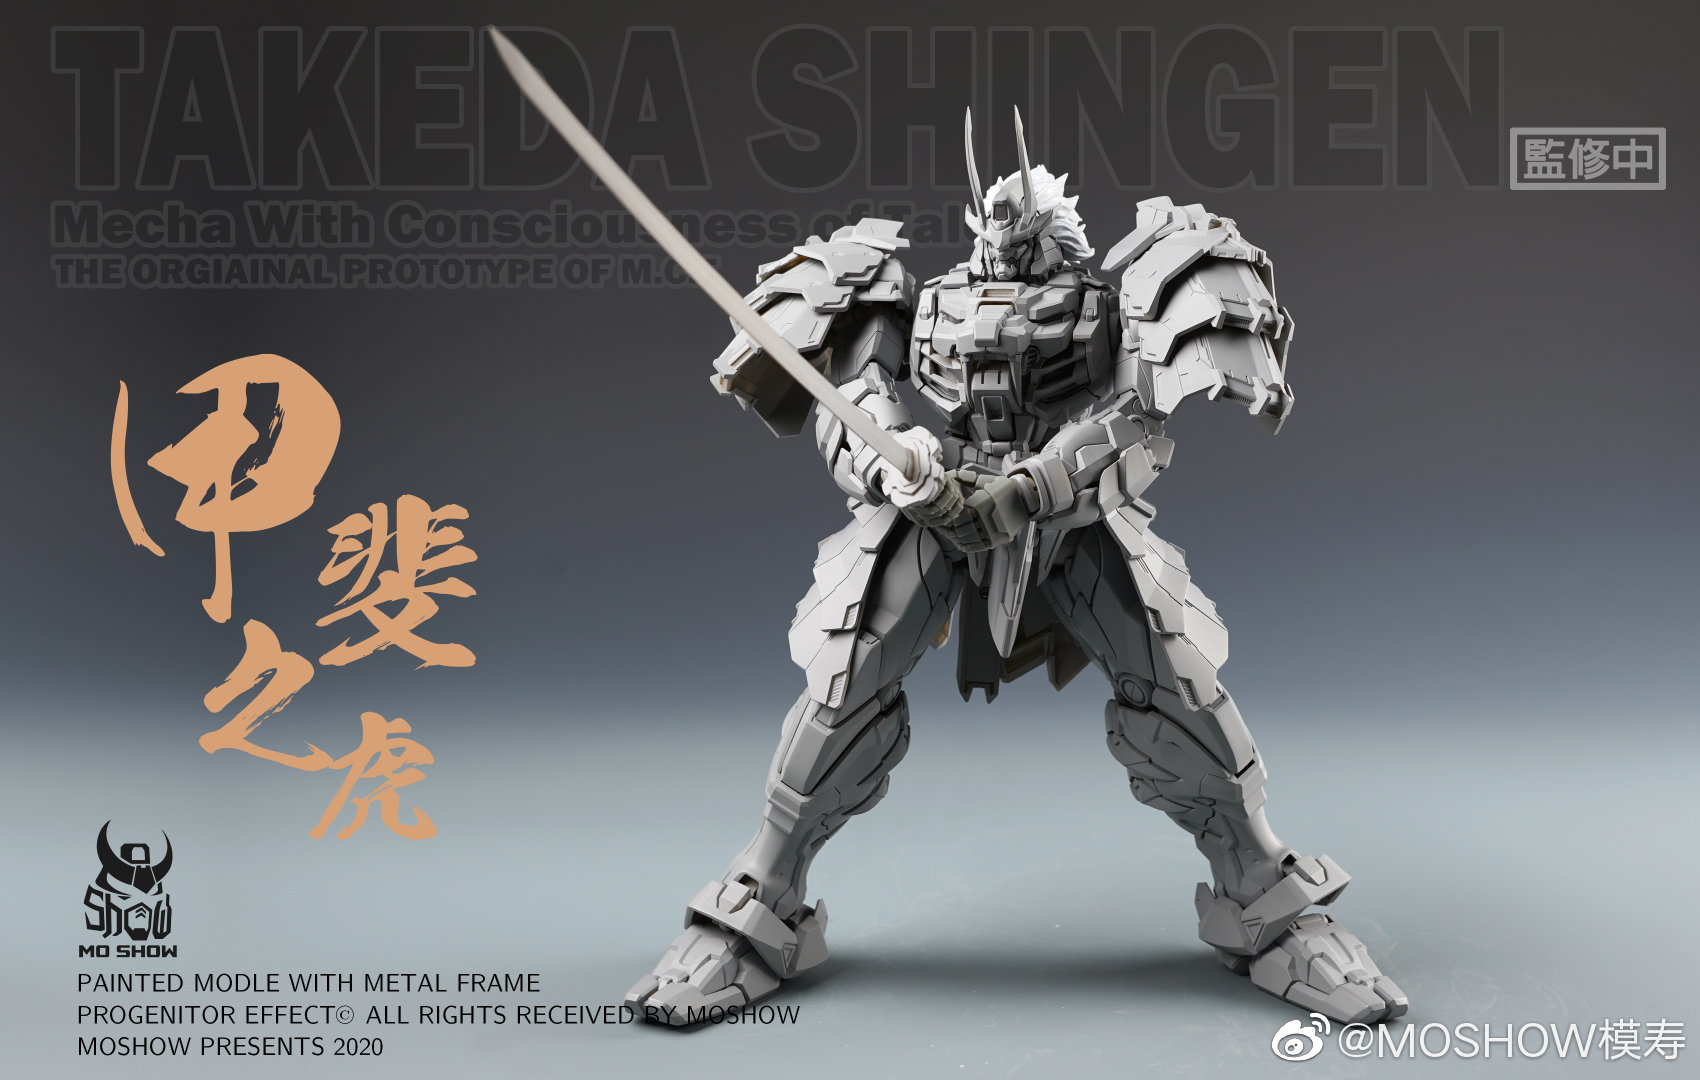 S504_MO_SHOW_takeda_shingen_008.jpg